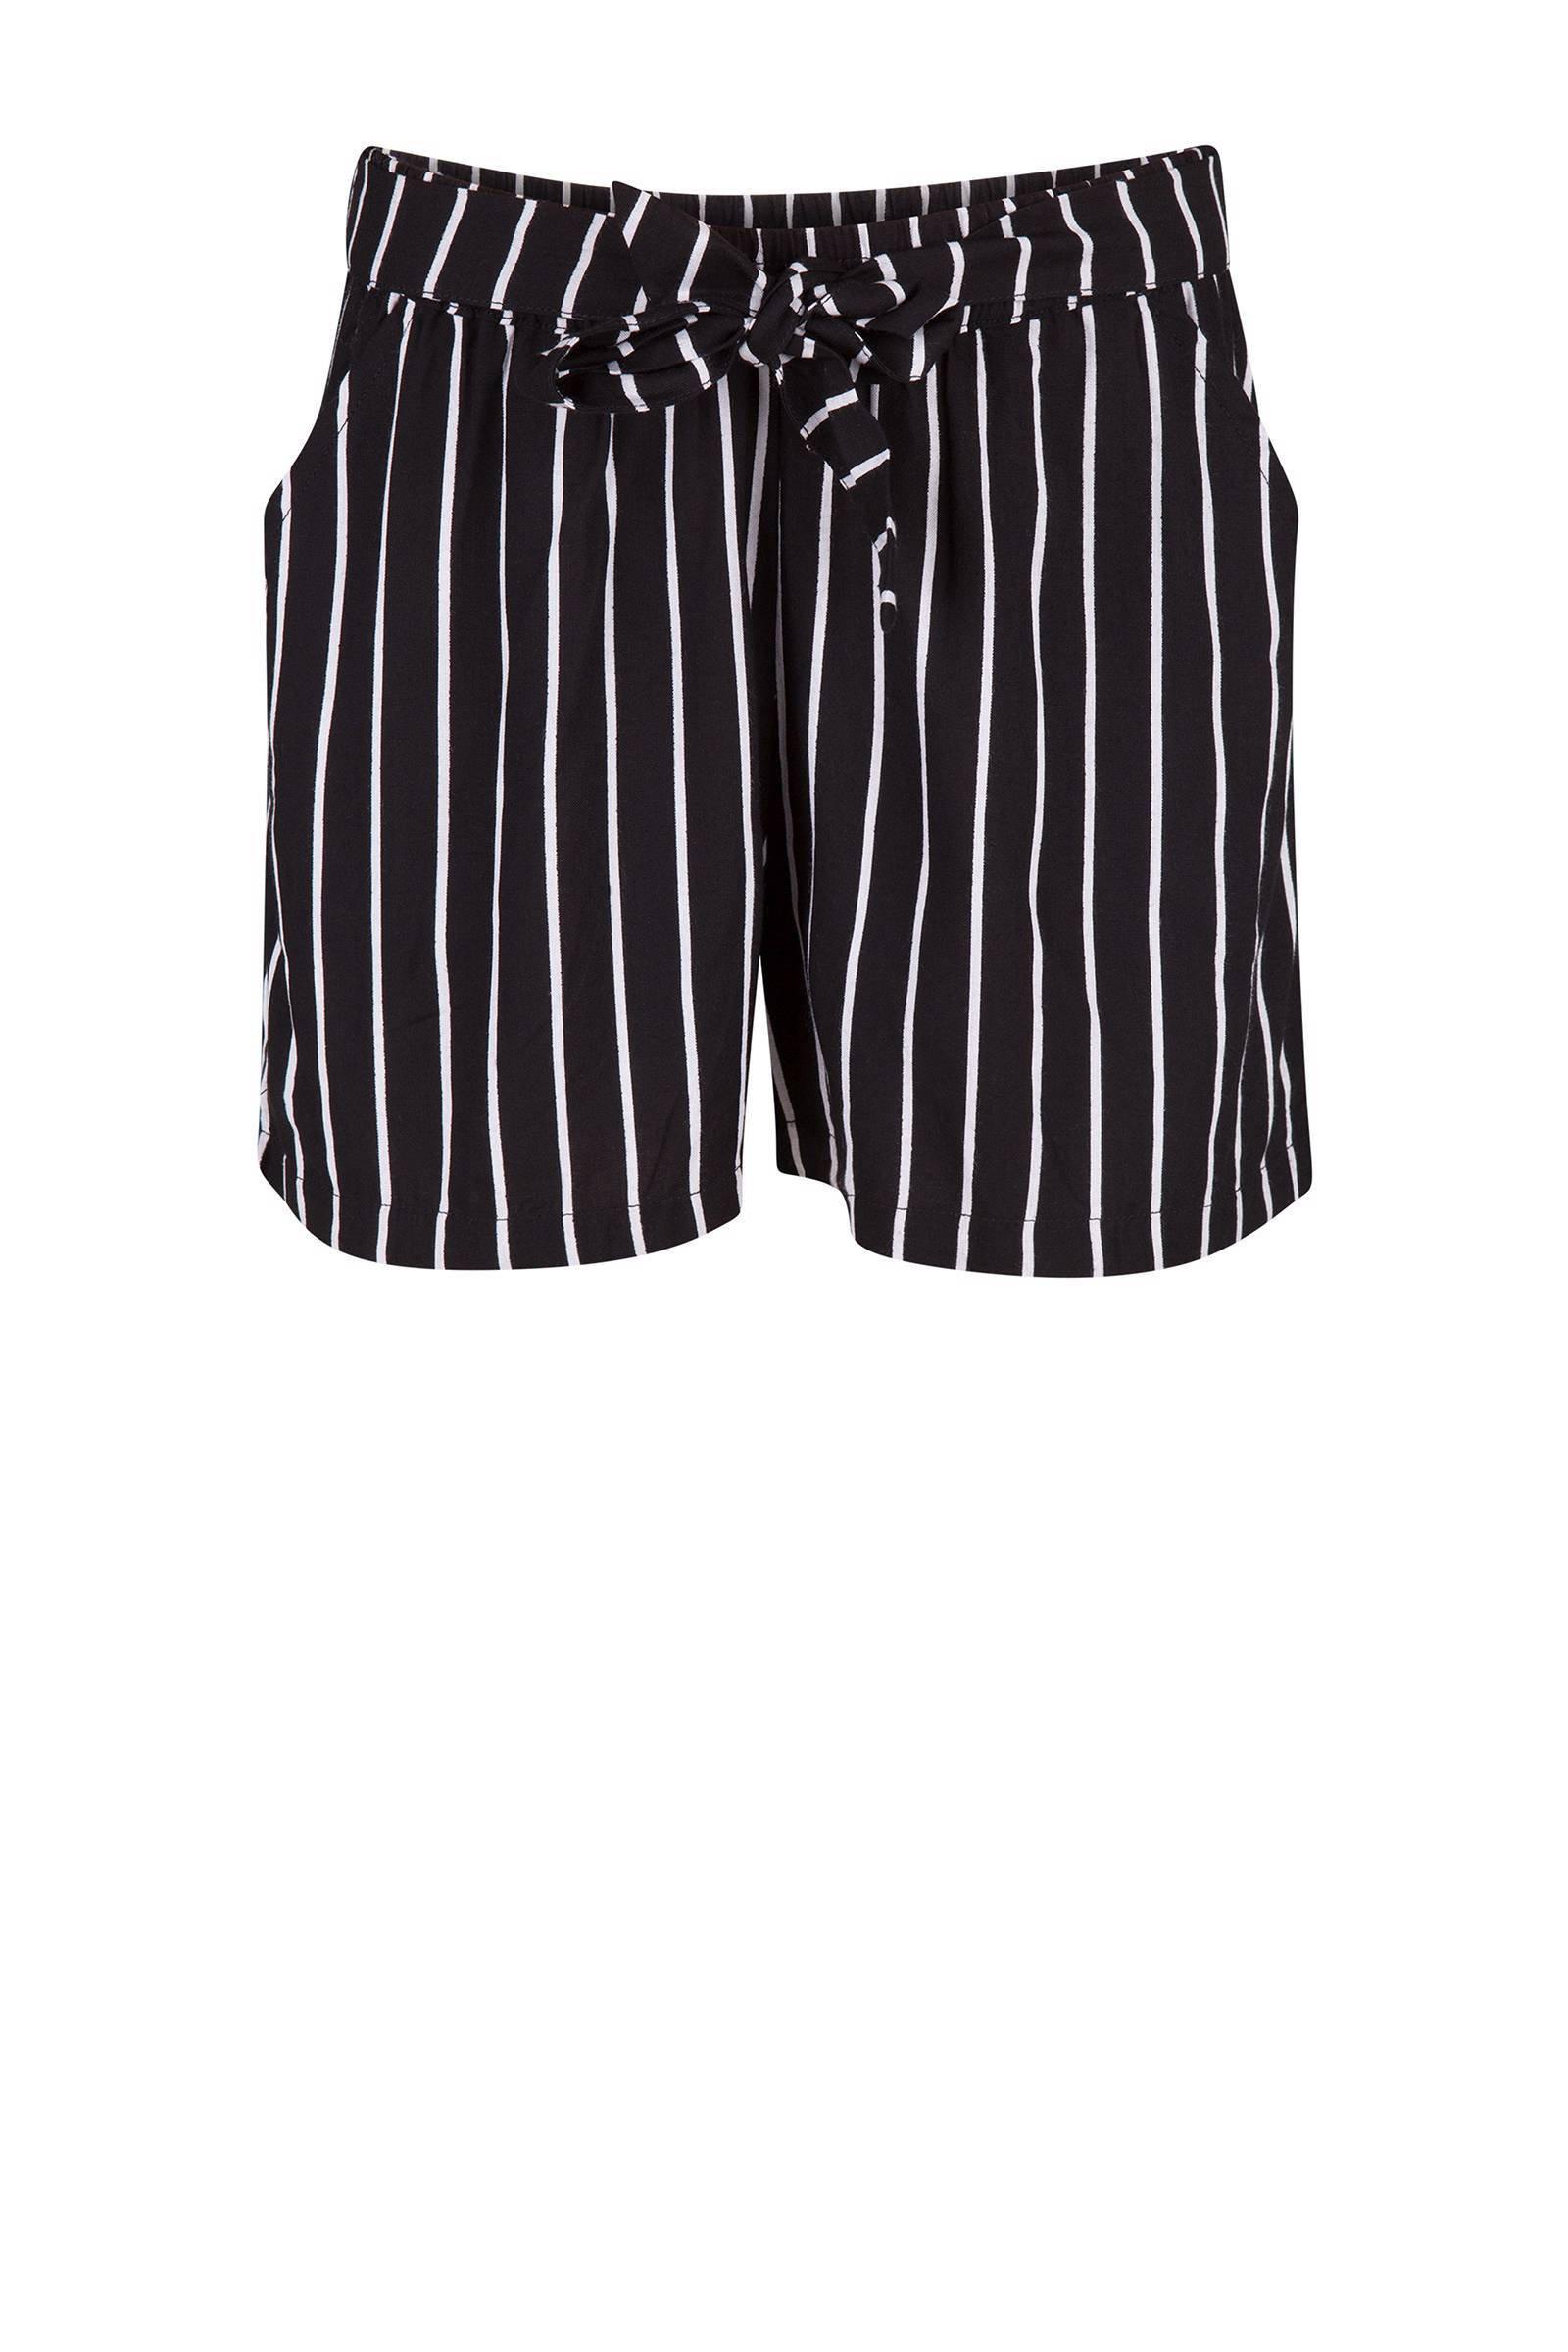 Ongekend WE Fashion gestreepte korte broek | wehkamp XG-68